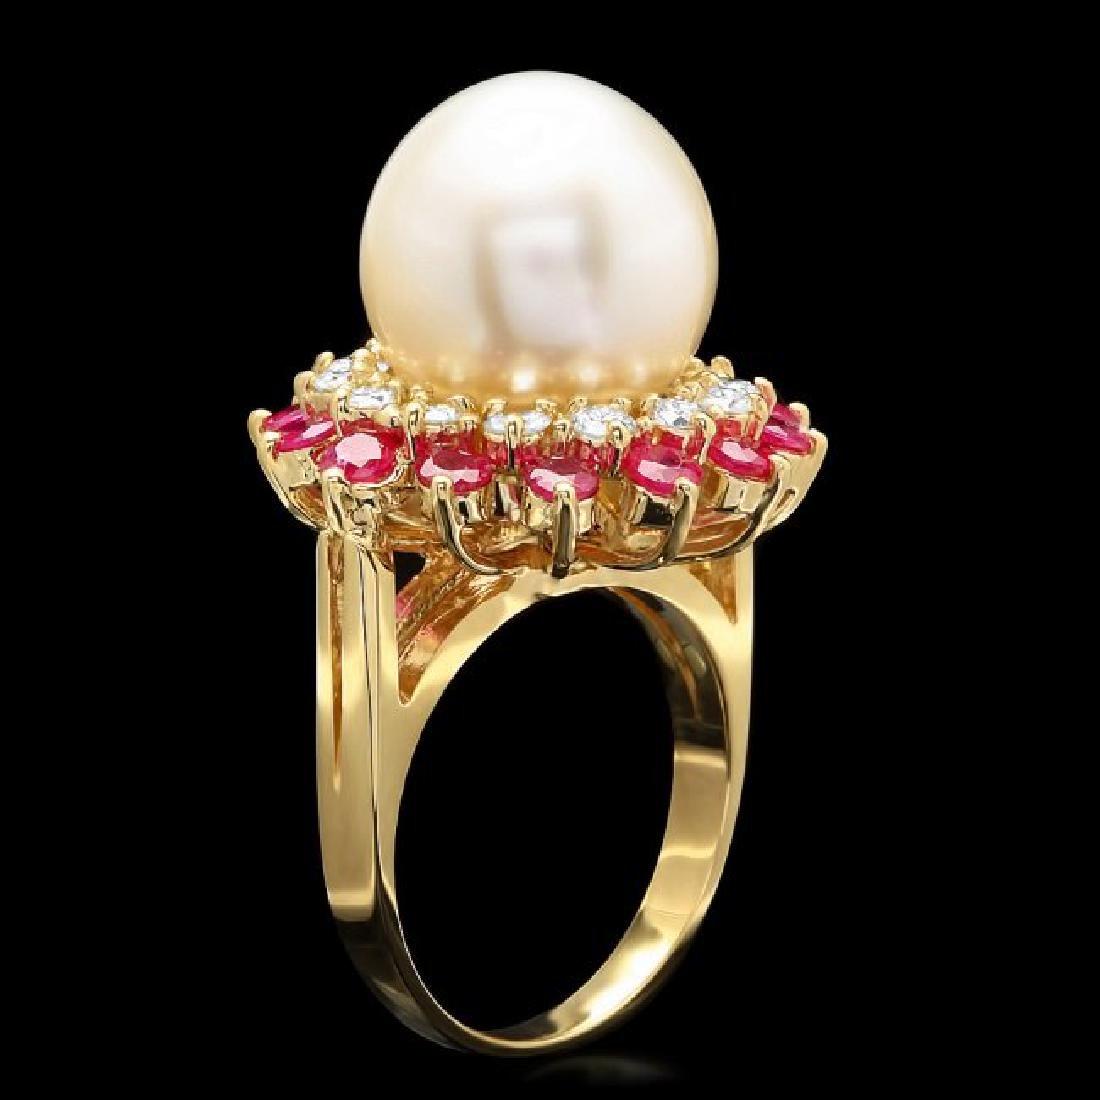 14k Gold 13 X 13mm Pearl 0.80ct Diamond Ring - 2